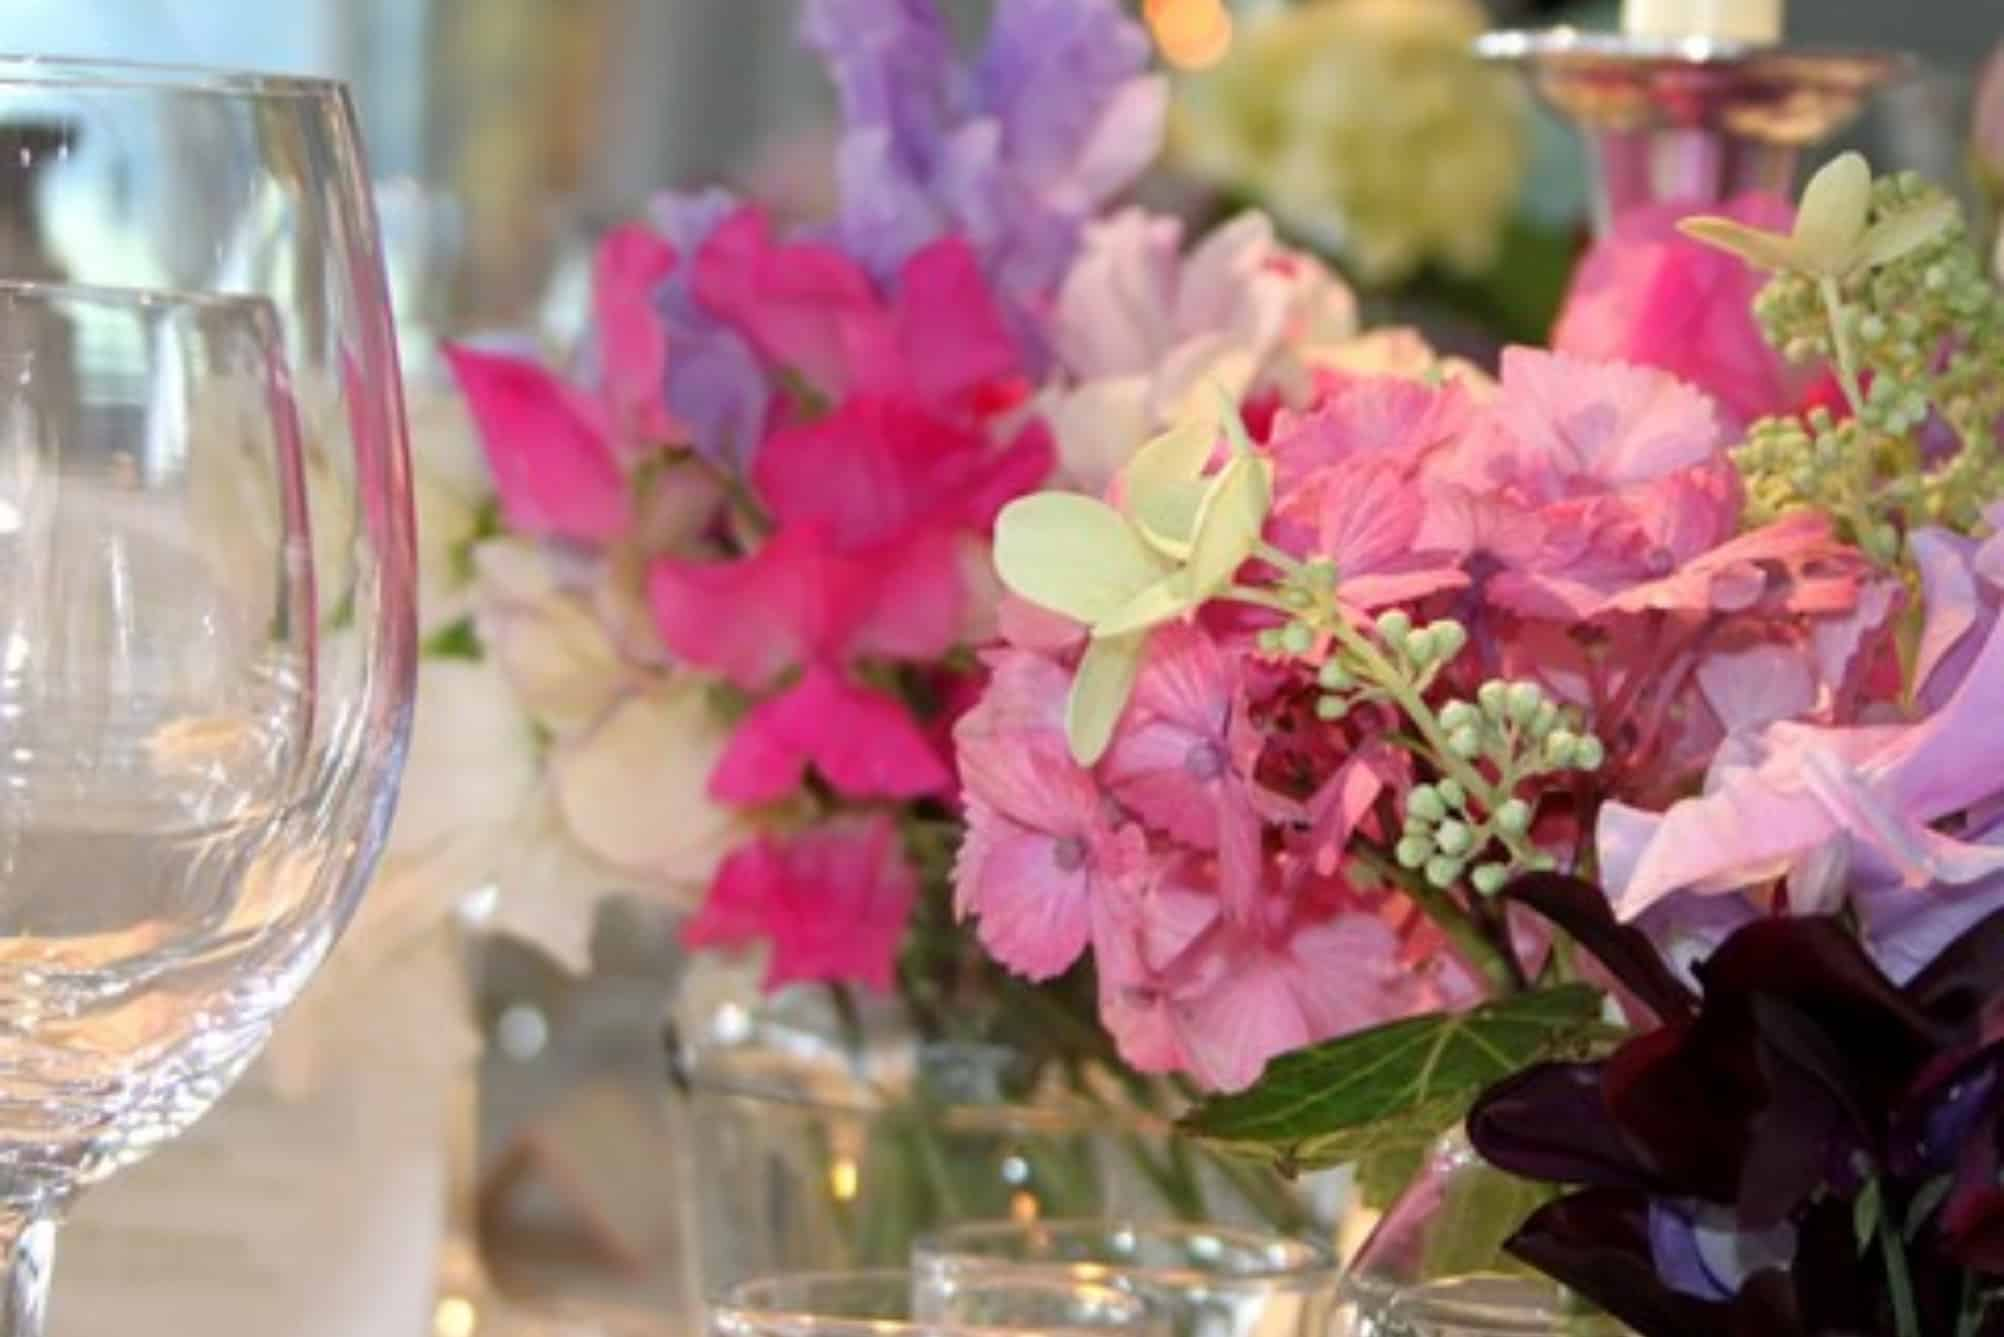 Colourful wedding centrepieces